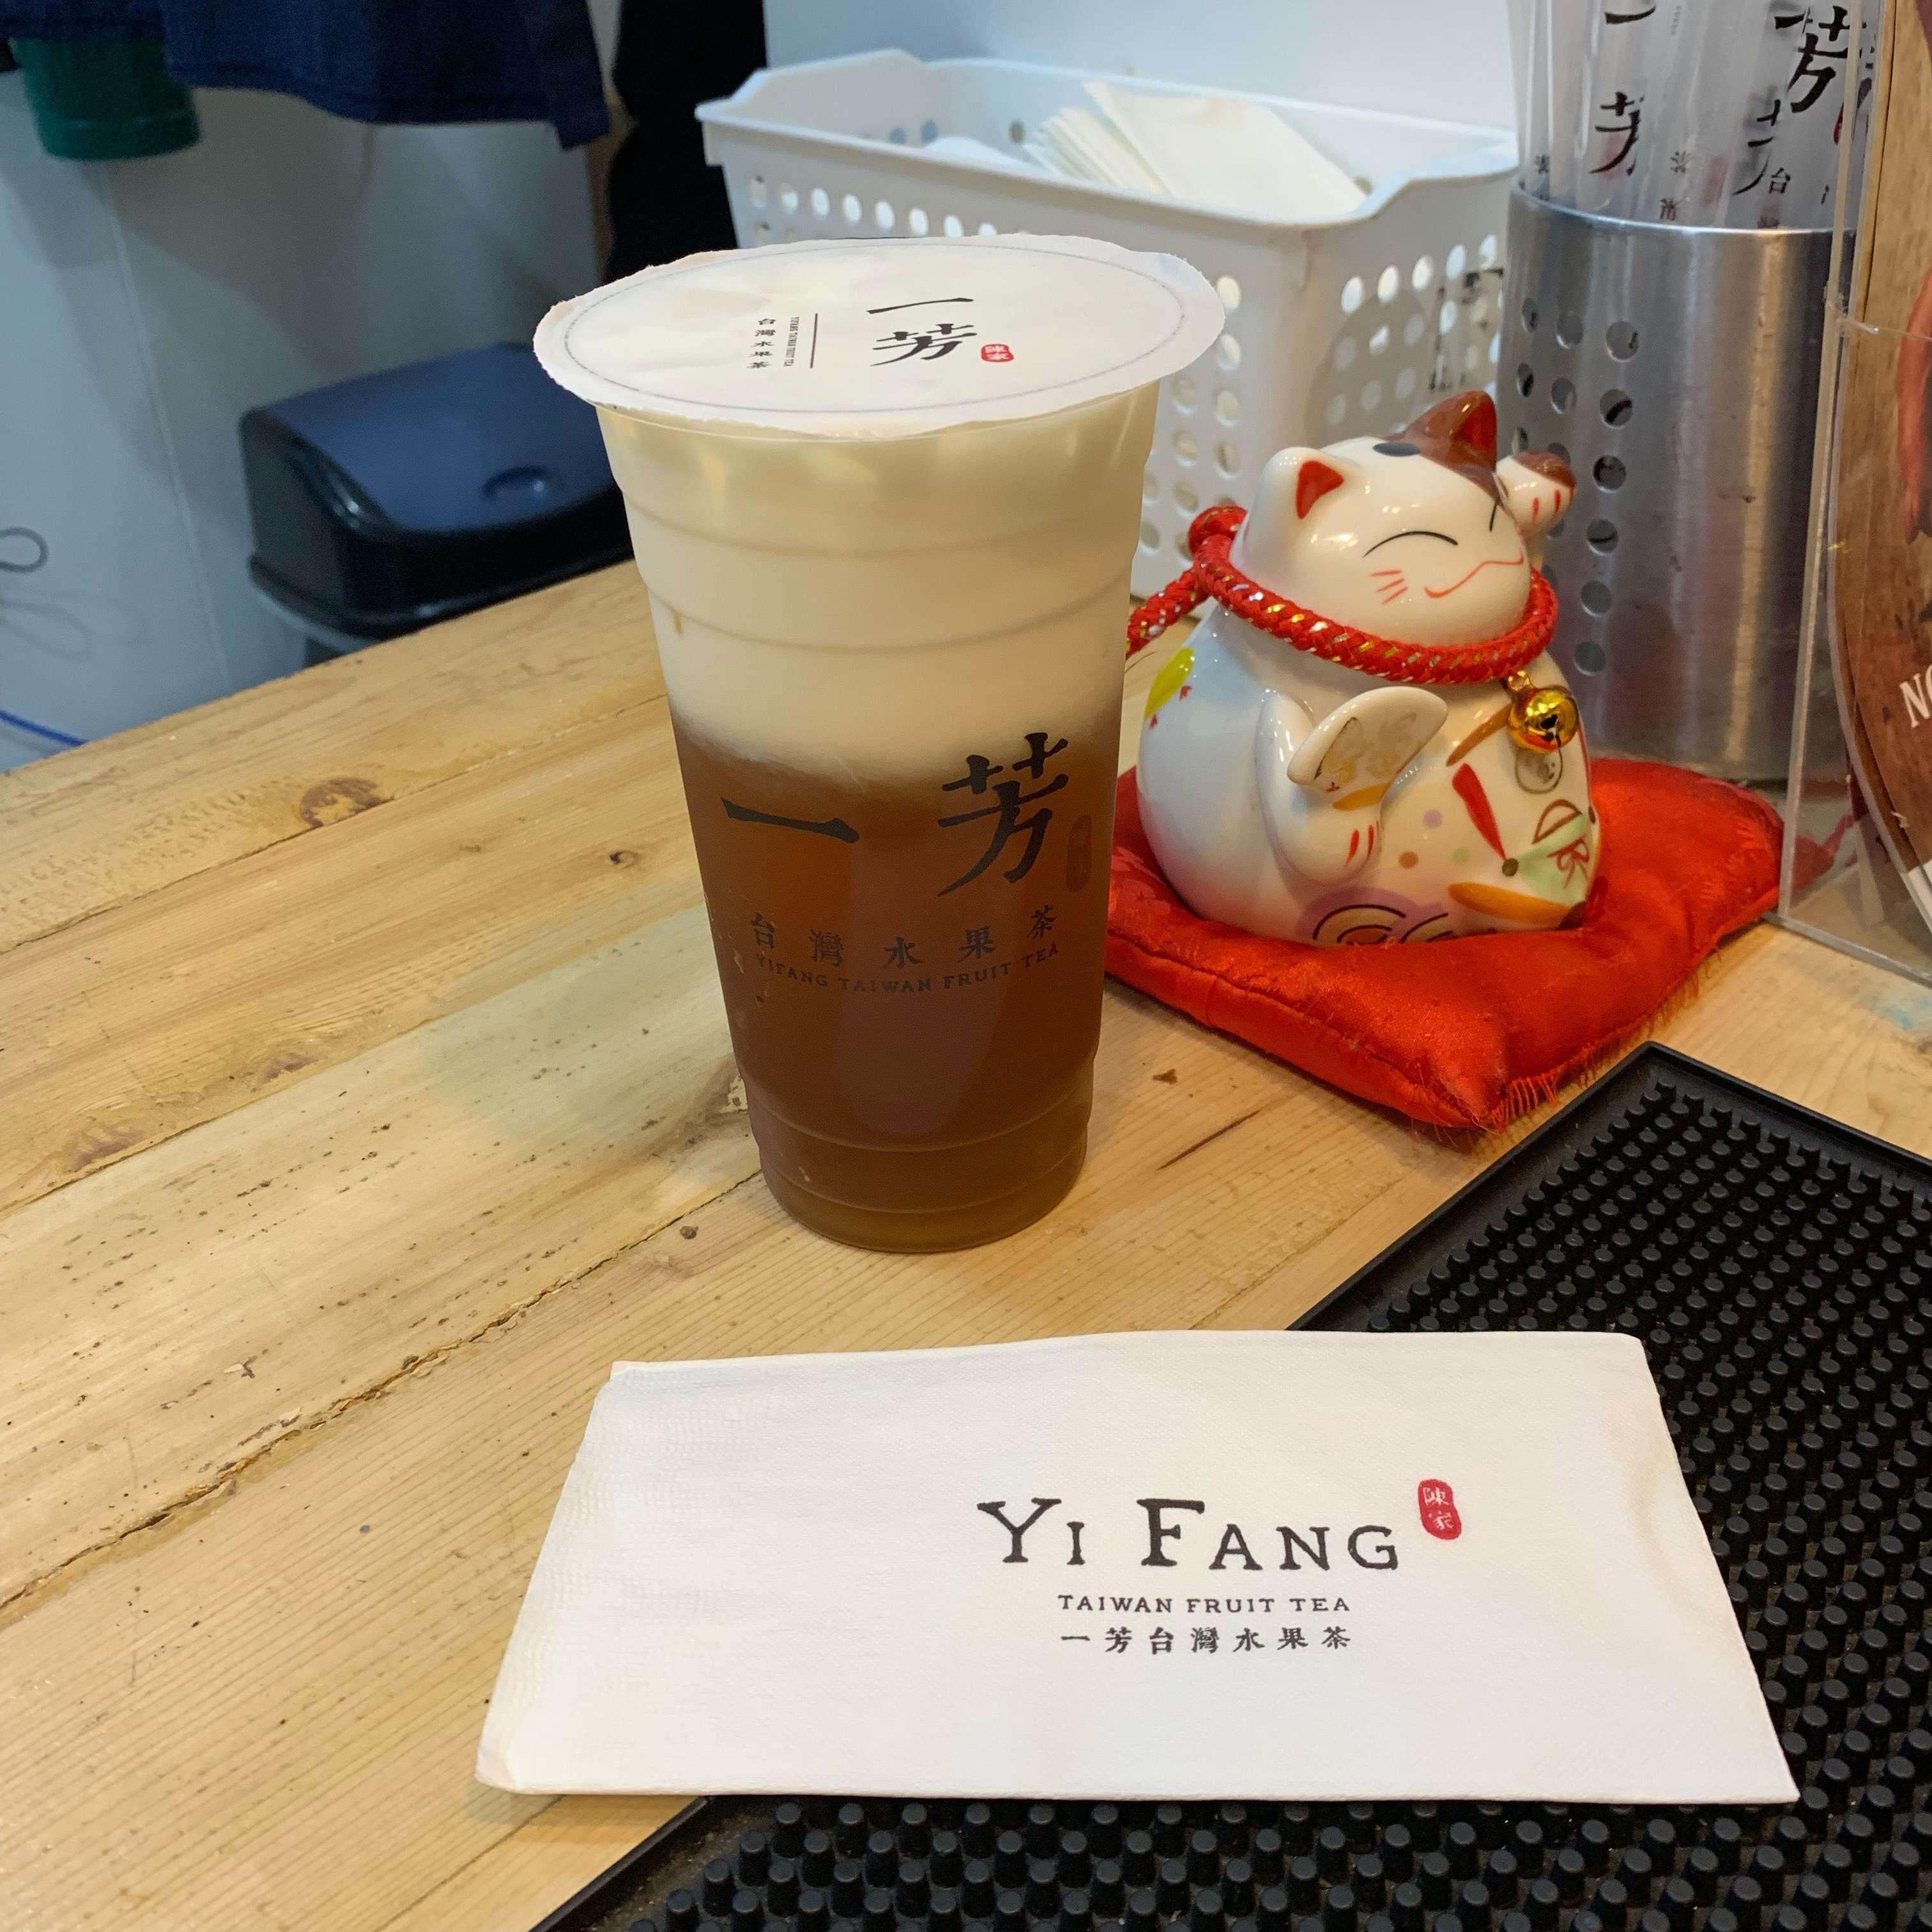 Yi fang milk tea